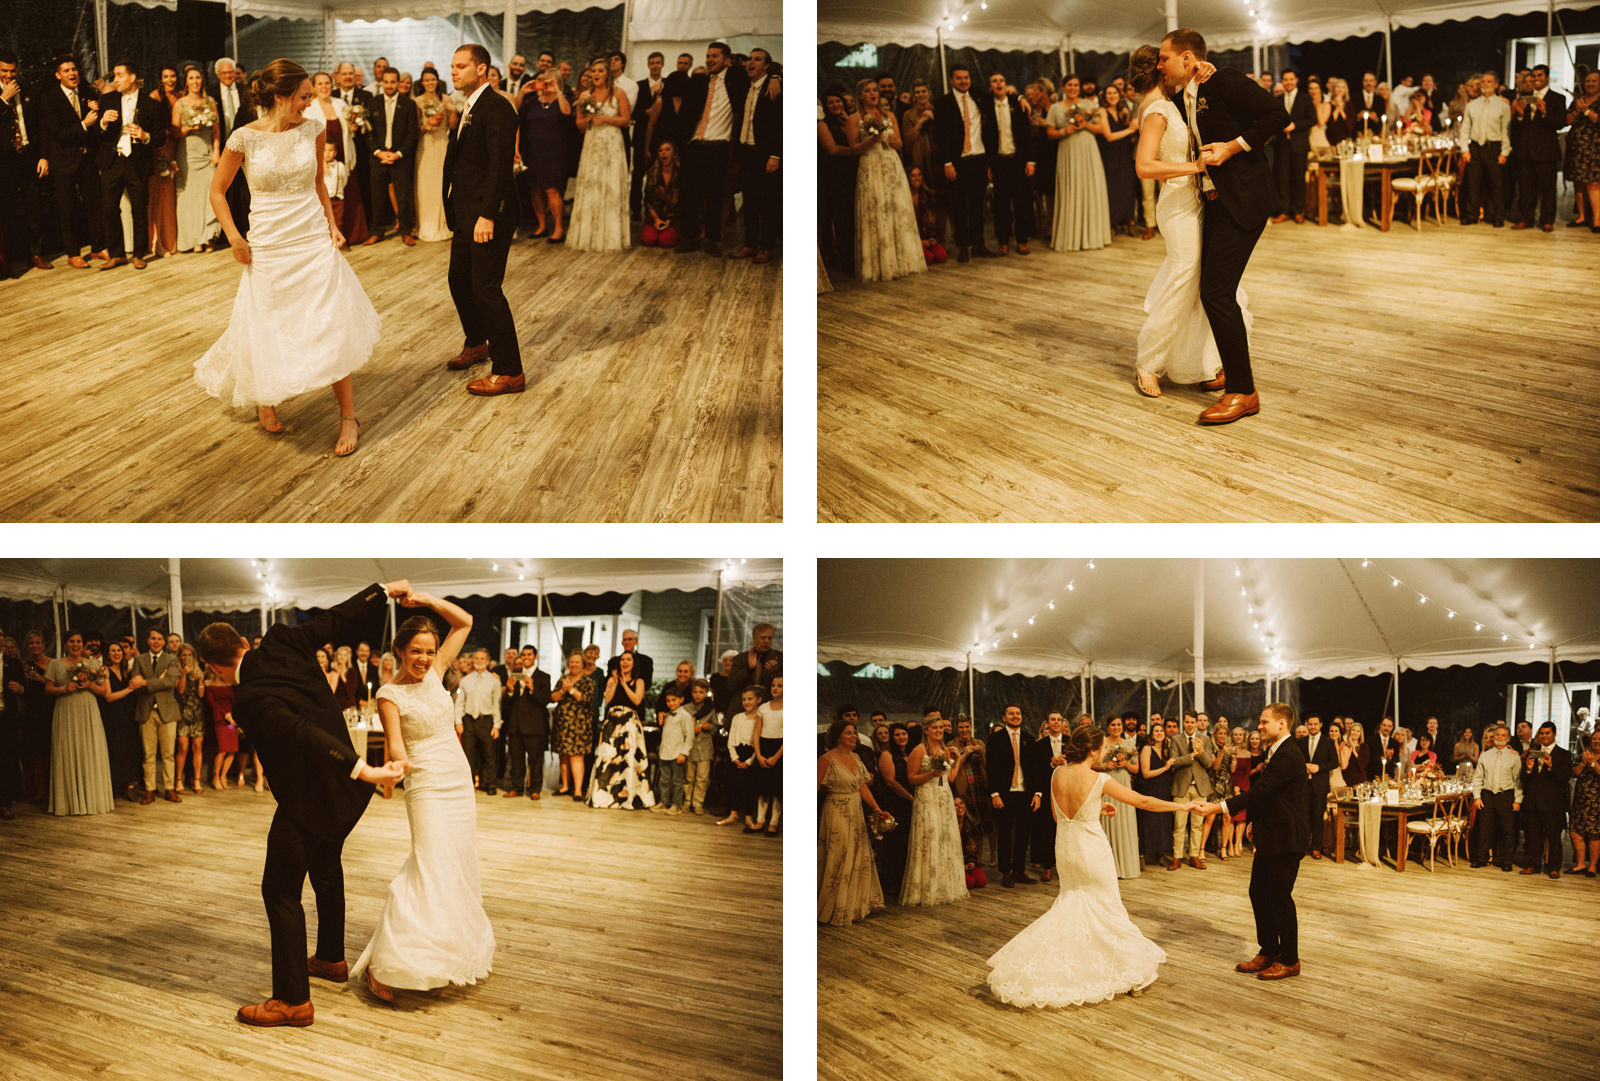 bridgeport-wedding-143 BRIDGEPORT, CONNECTICUT BACKYARD WEDDING